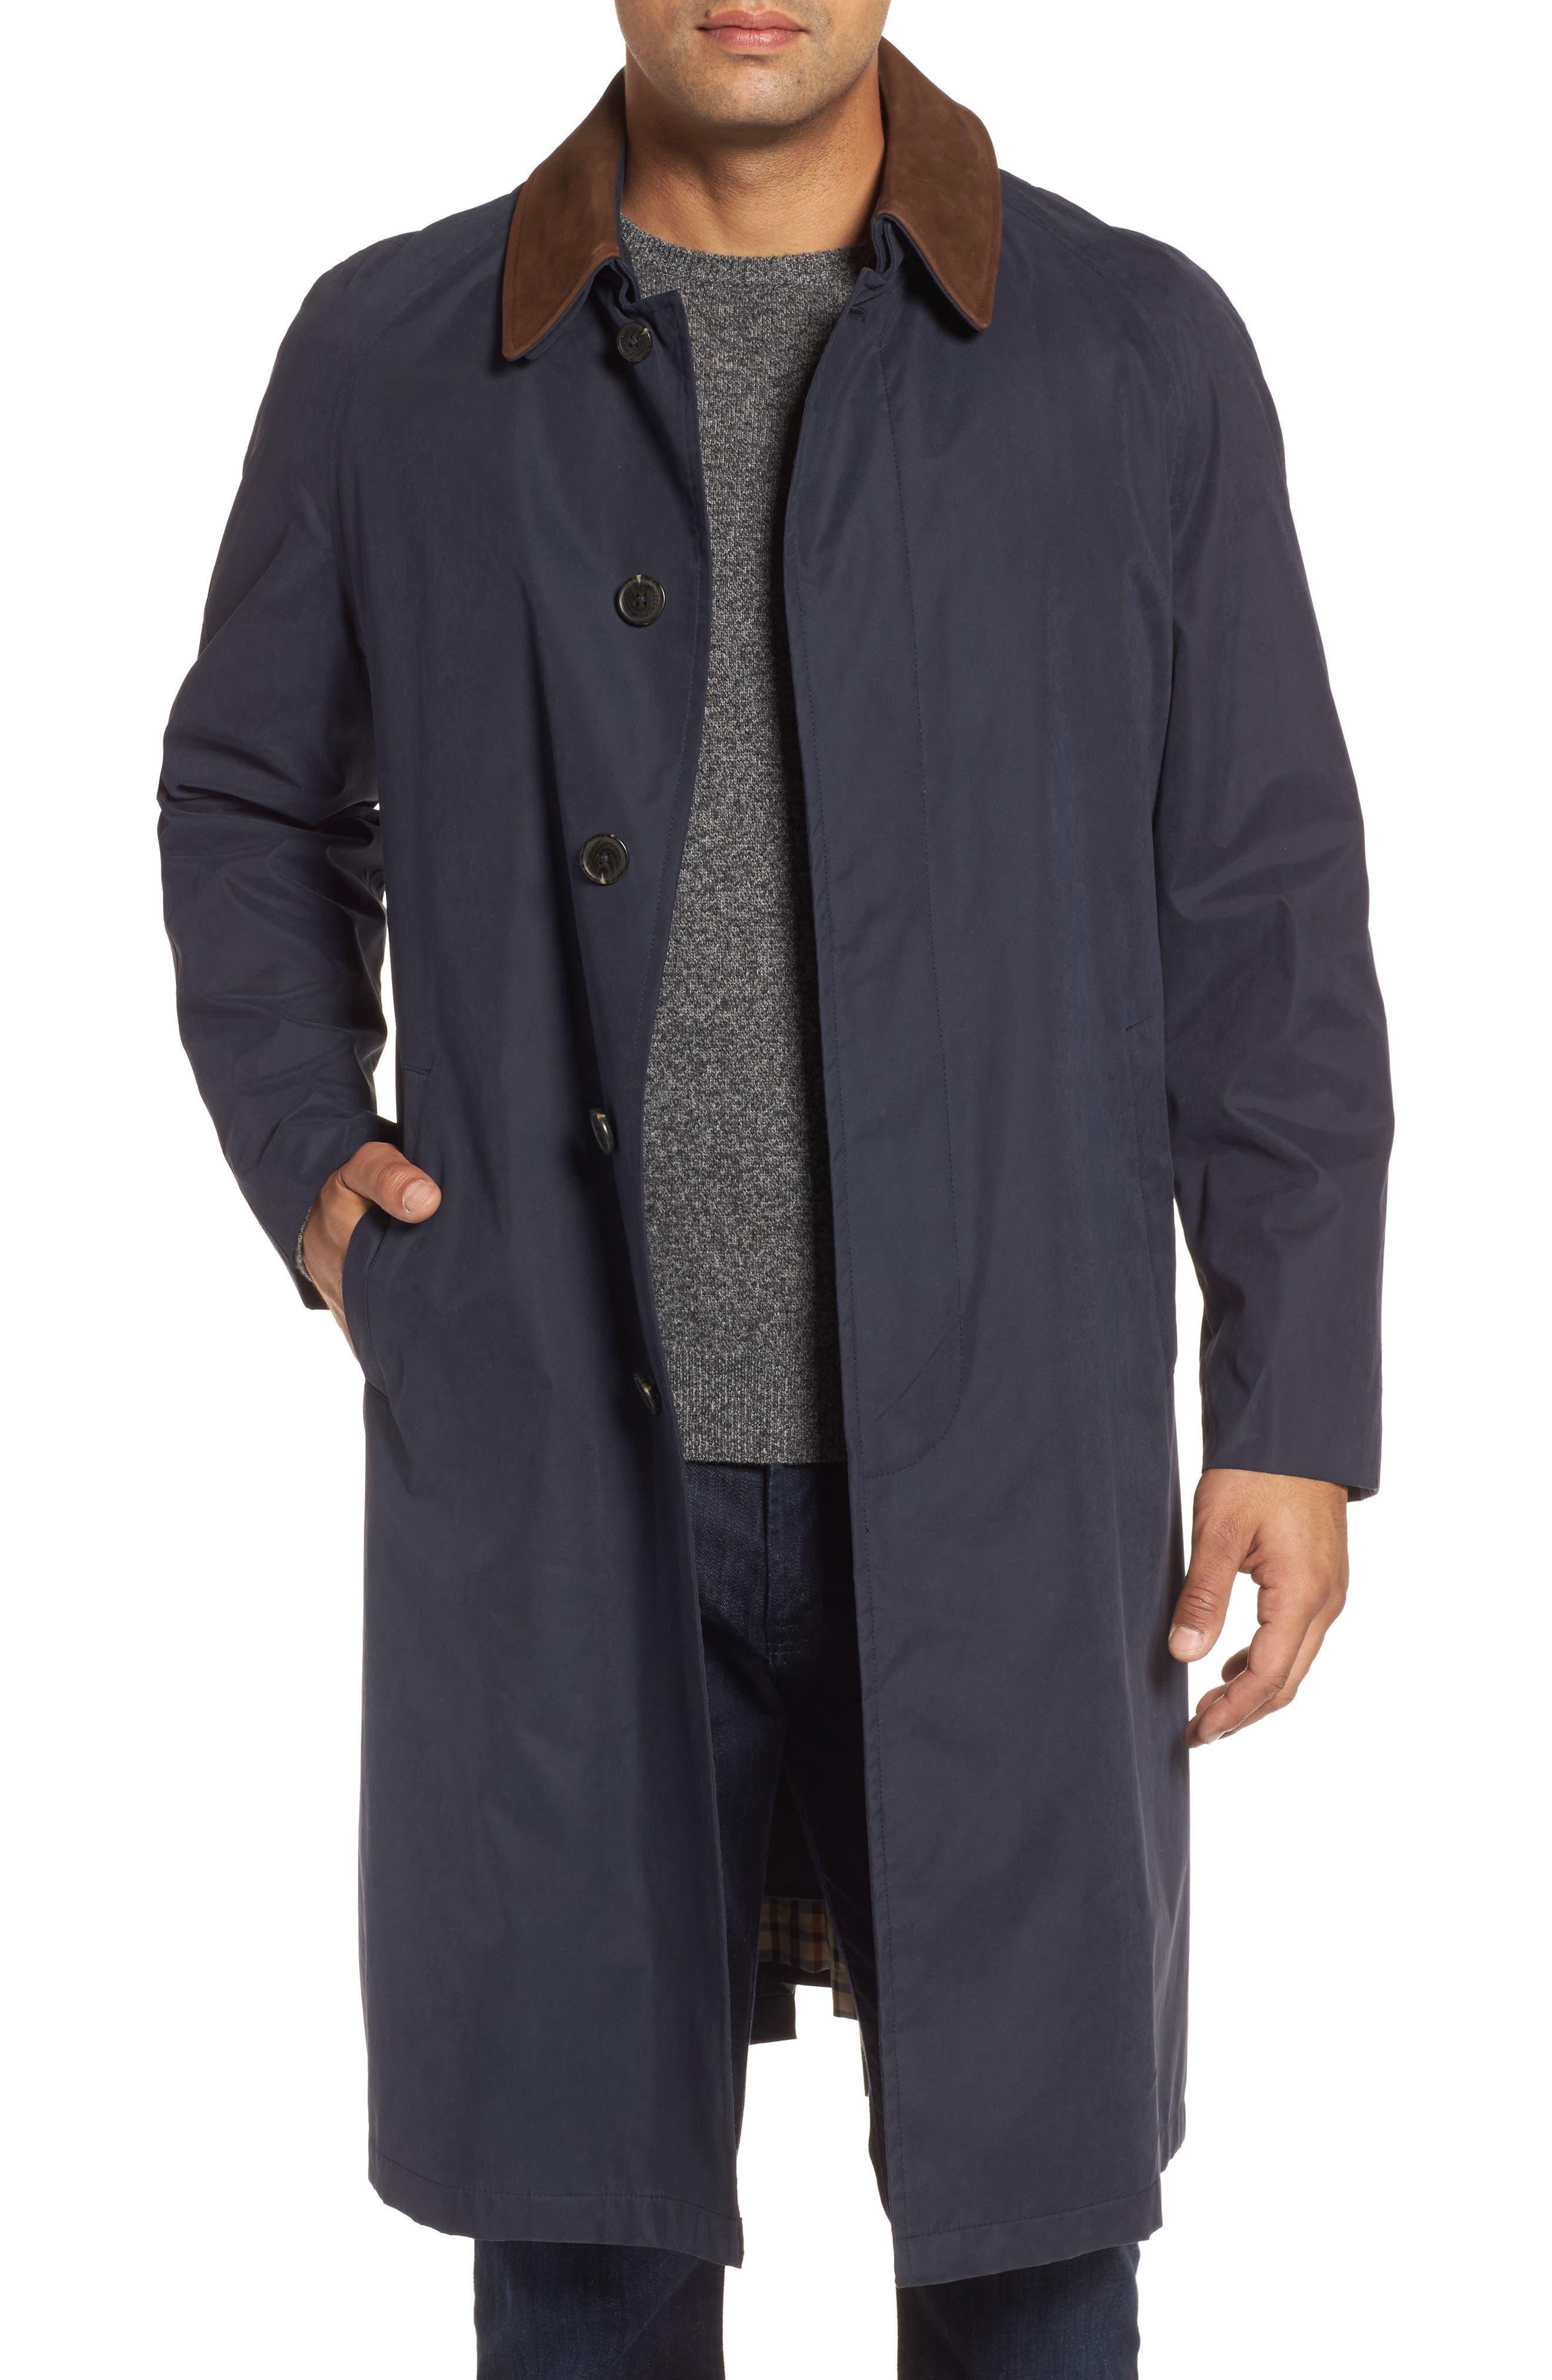 Lawrence Classic Fit Rain Coat,                             Main thumbnail 1, color,                             410